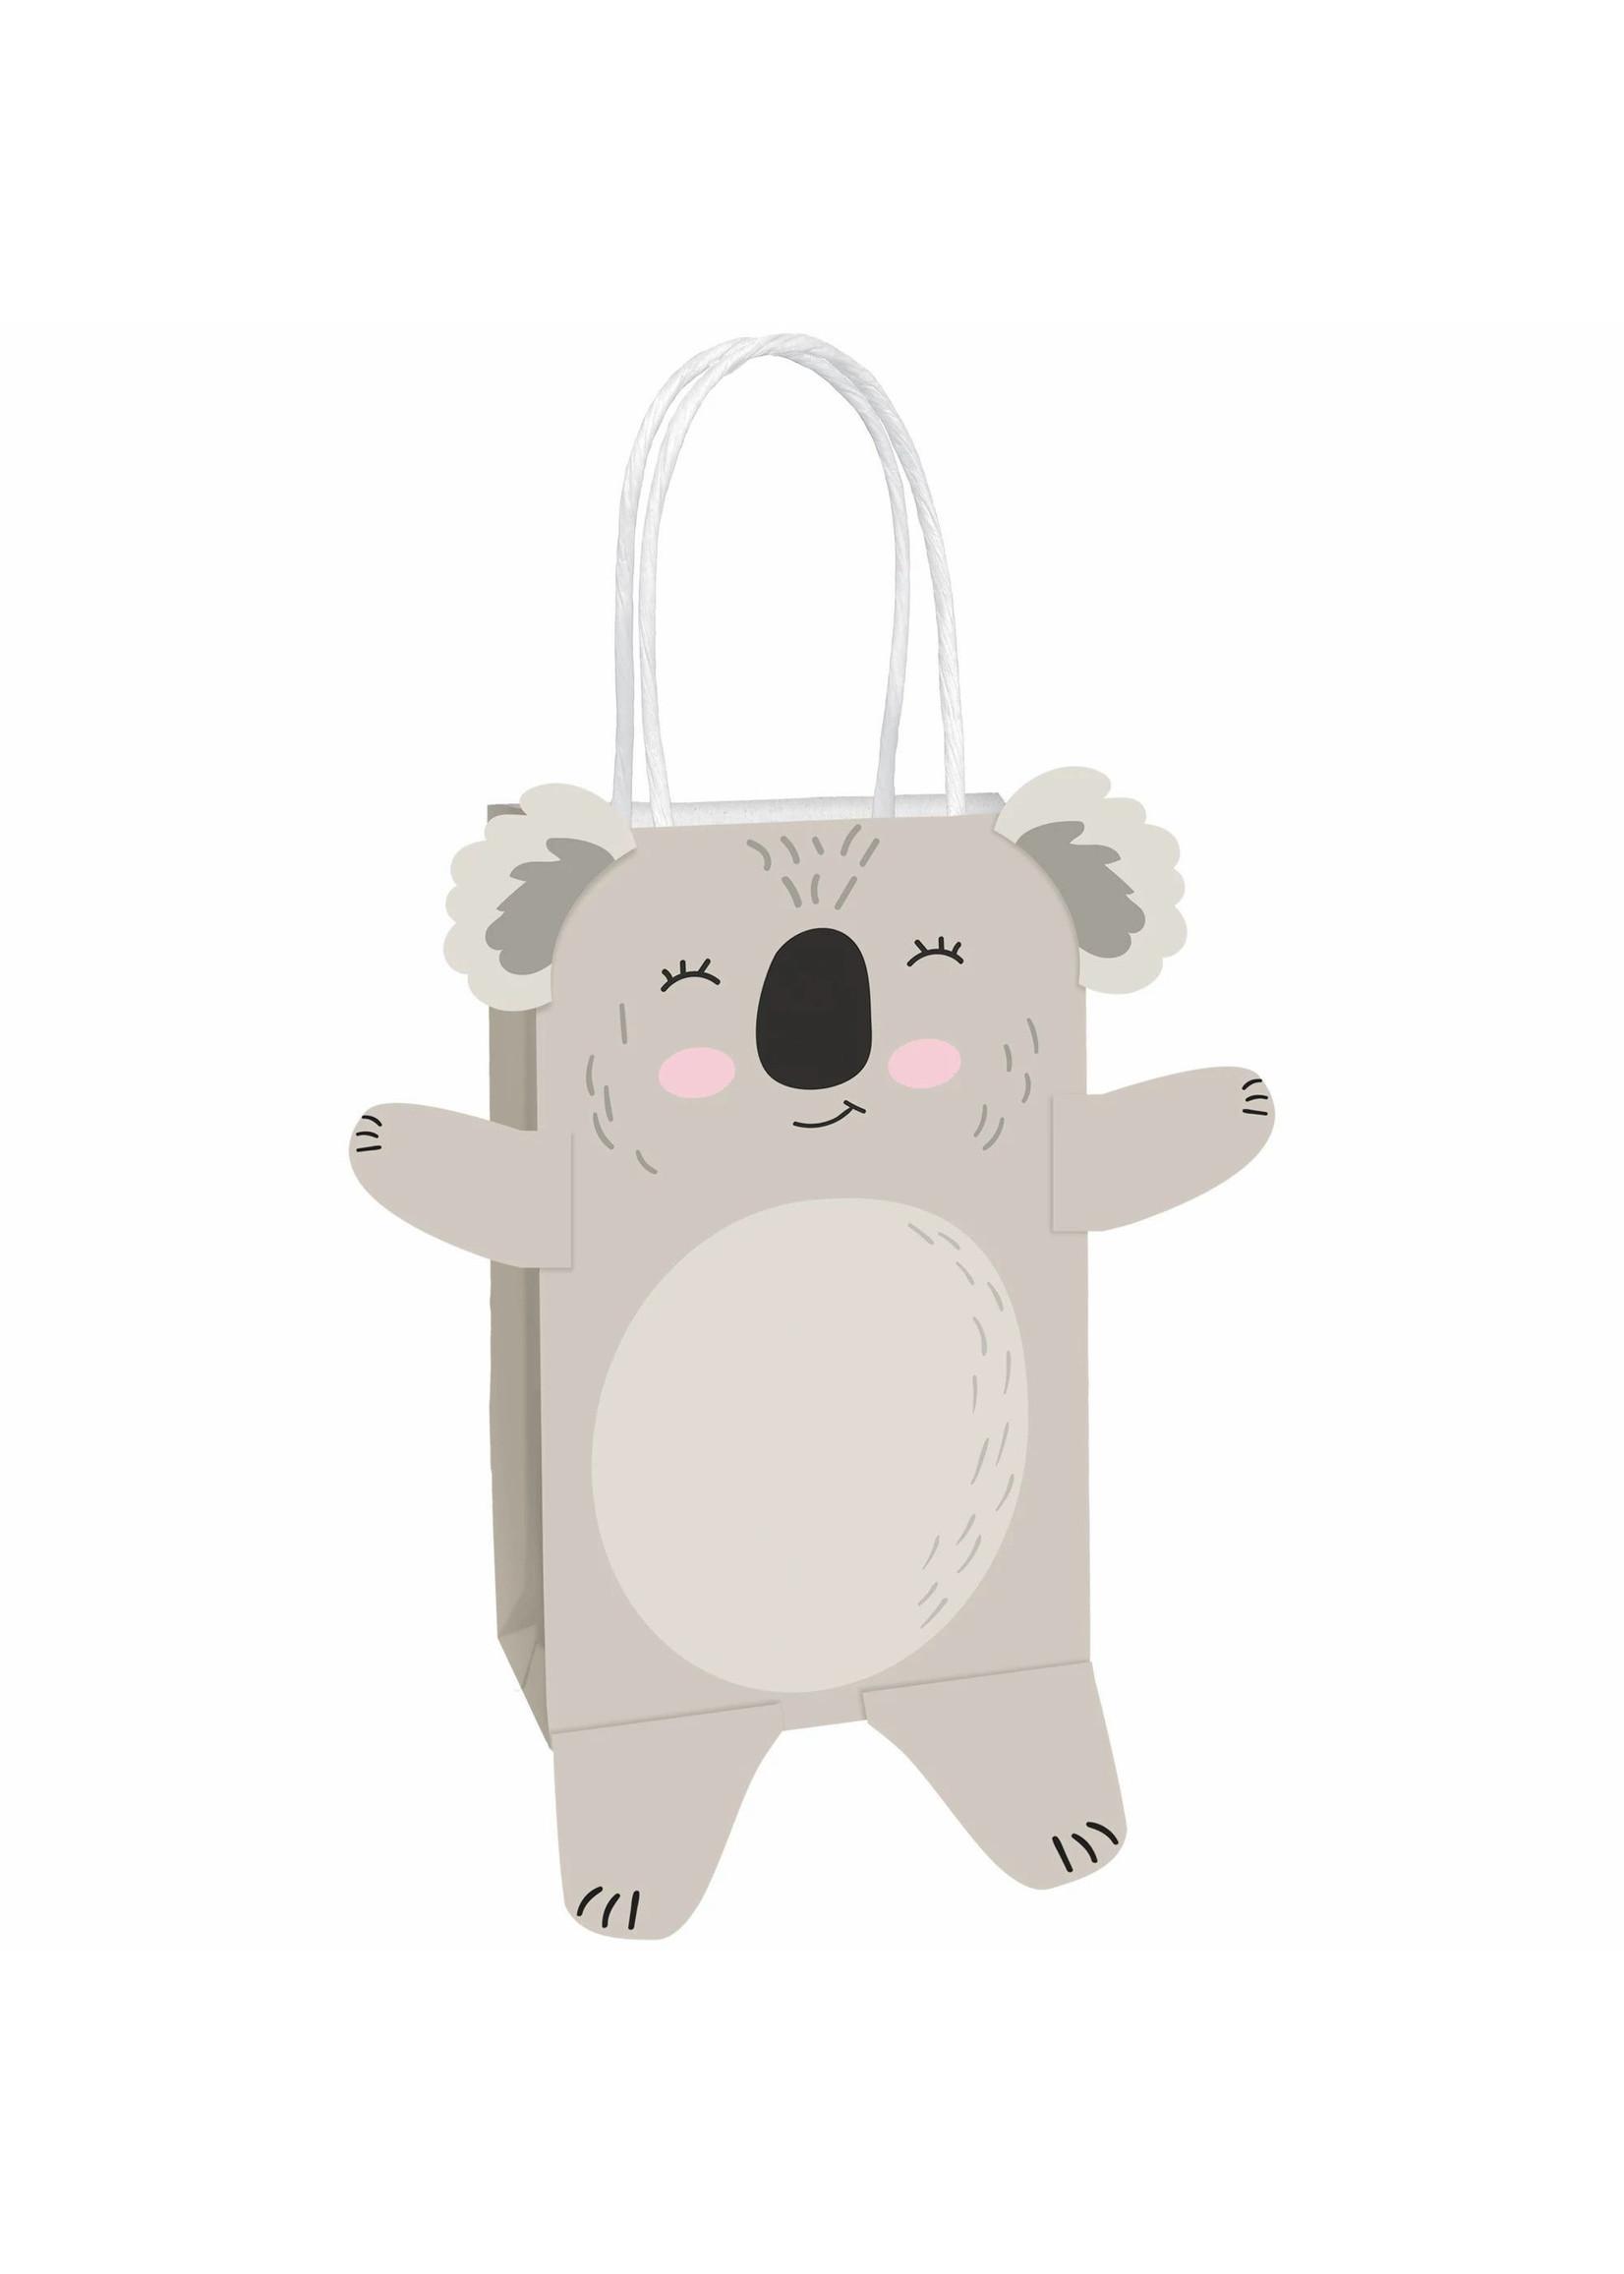 Koala Create Your Own Bag - 8ct